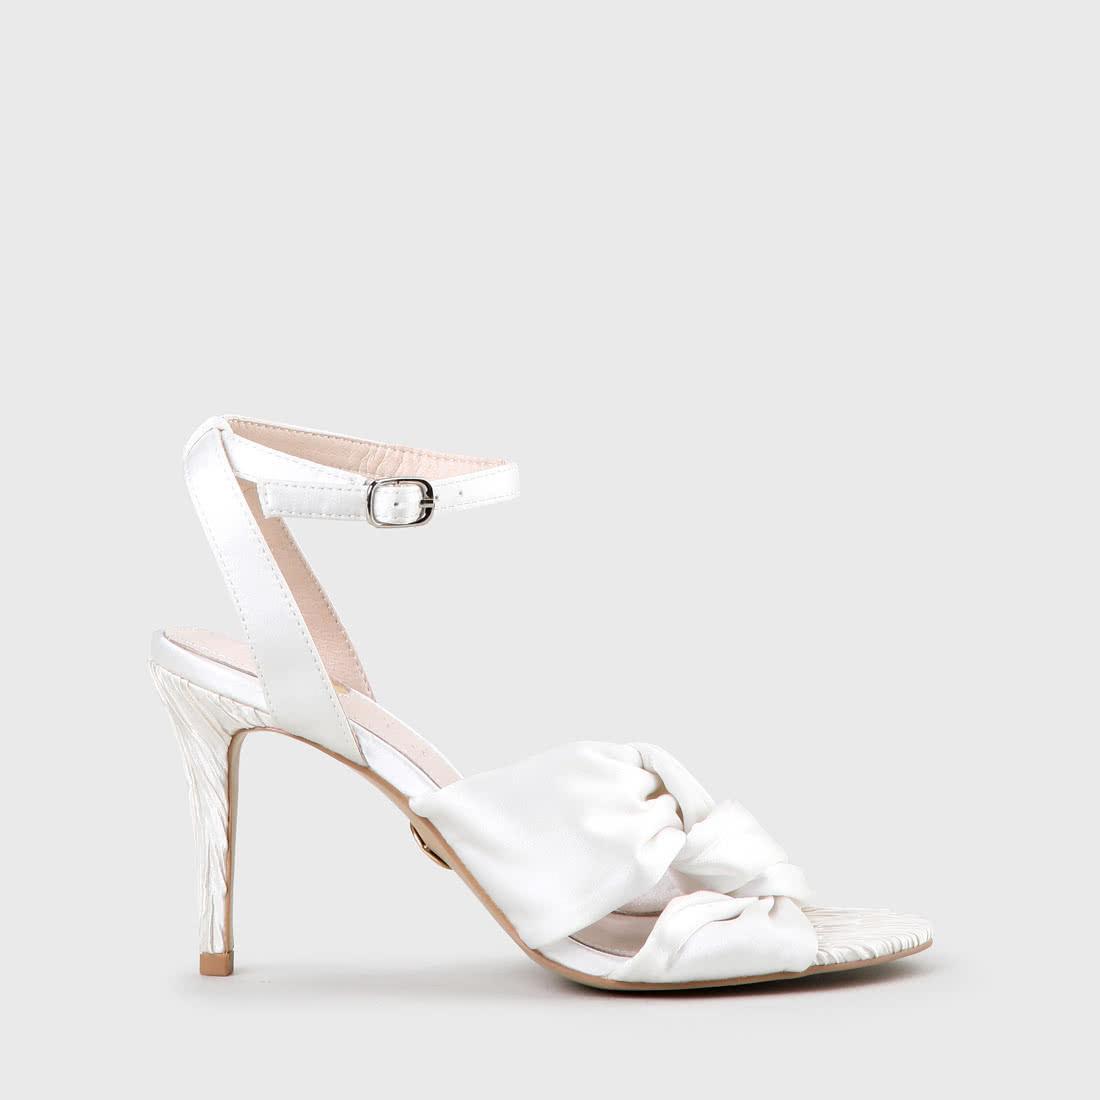 Satin Weiß Ebru Sandalette Satin Ebru Sandalette Aus Aus PkXiuOZ